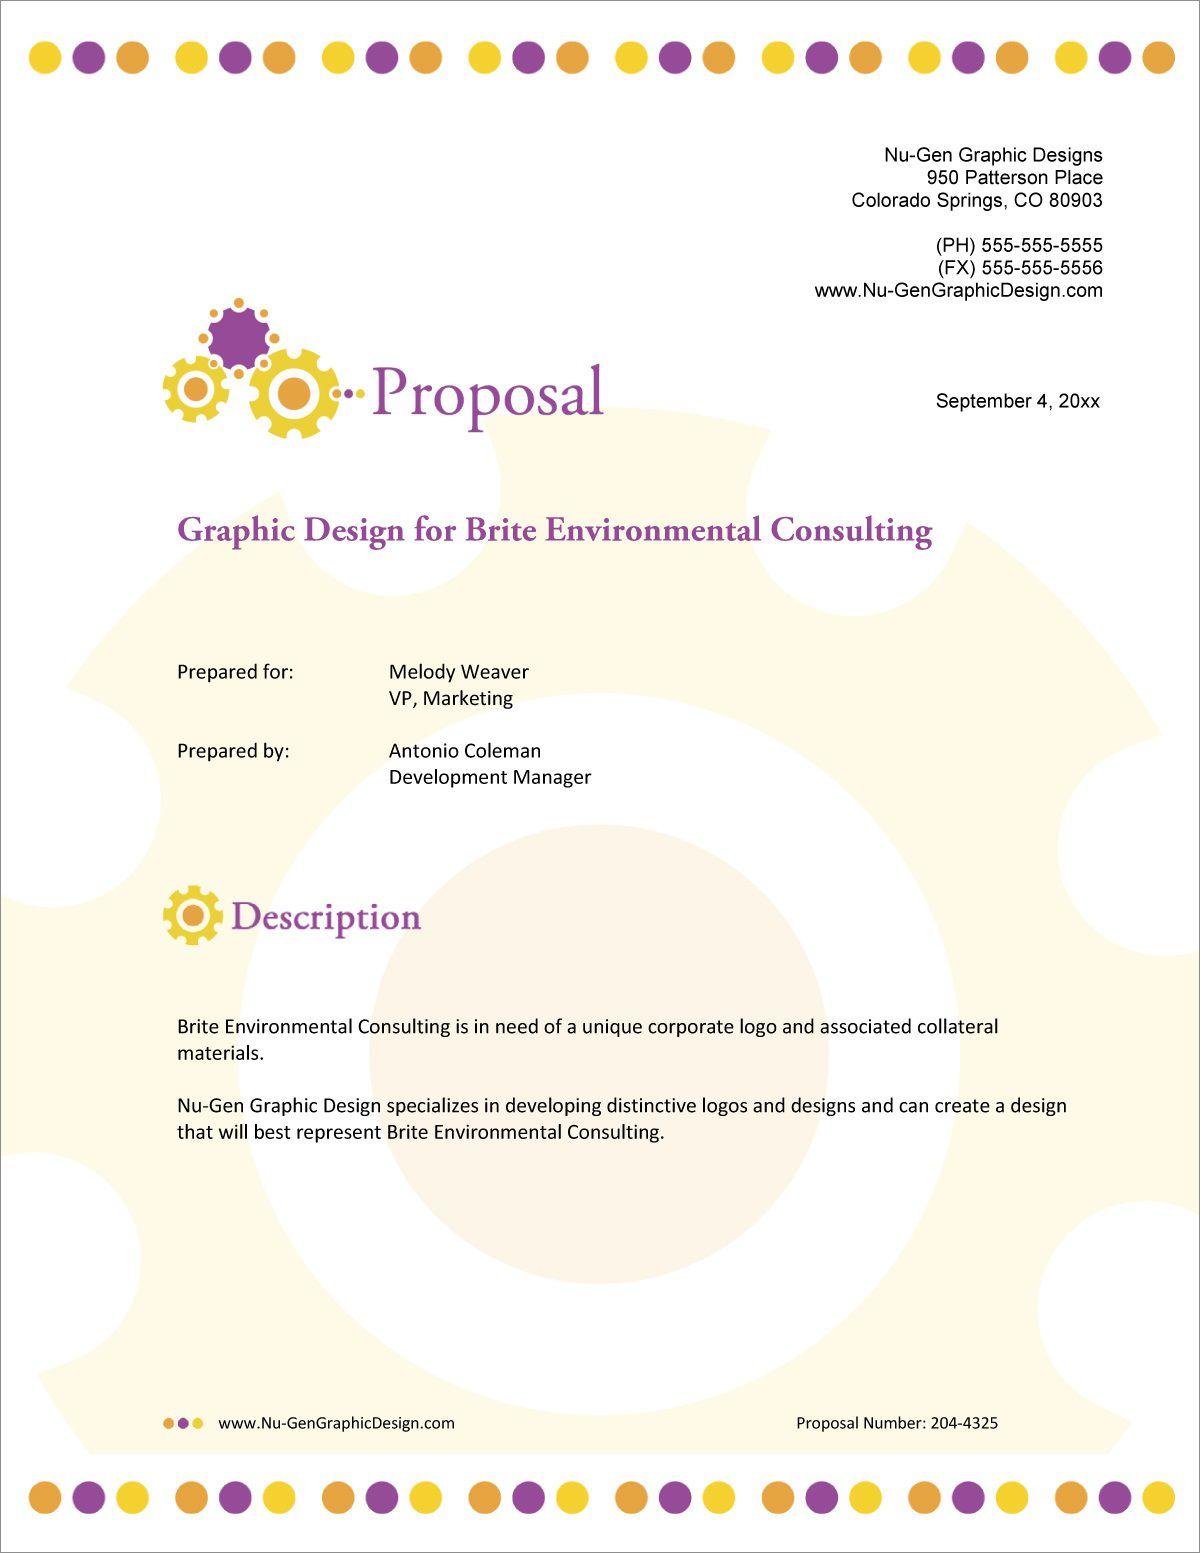 002 Unique Graphic Design Proposal Template Free High Def  Freelance Pdf IndesignFull